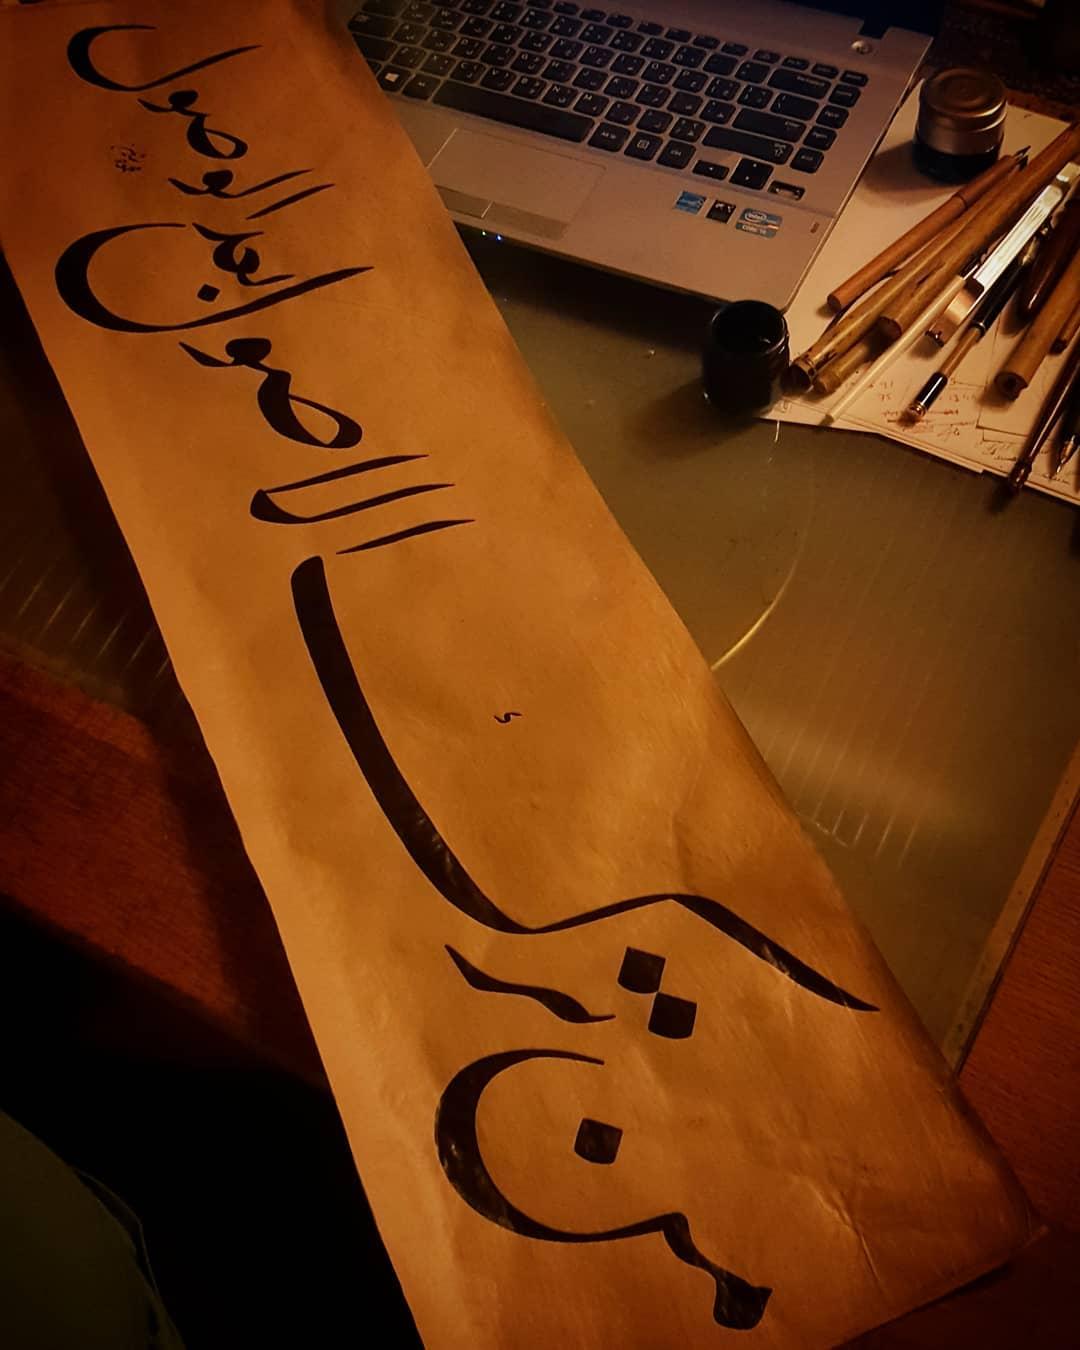 Donwload Photo 2020 Ramazan-ıŞerif yazıları 26..... Usul olmadan vusul olmaz... Bugün tasavvufi...- Hattat Mahmud 1